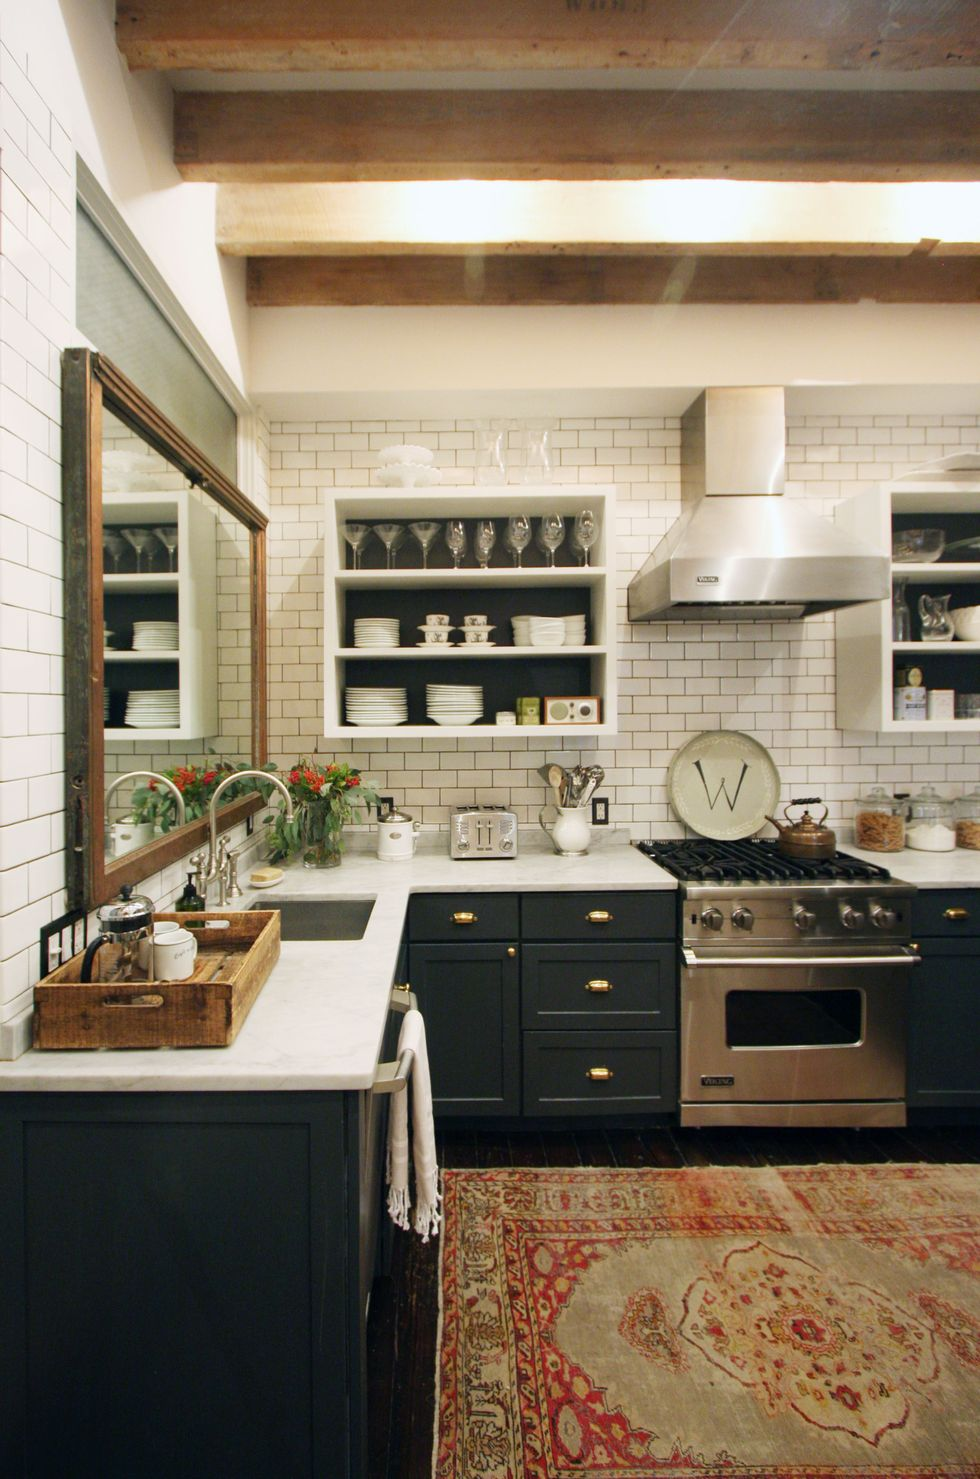 9 1 Mirror In Kitchen Ideas That Will Blow Your Mind Decoholic